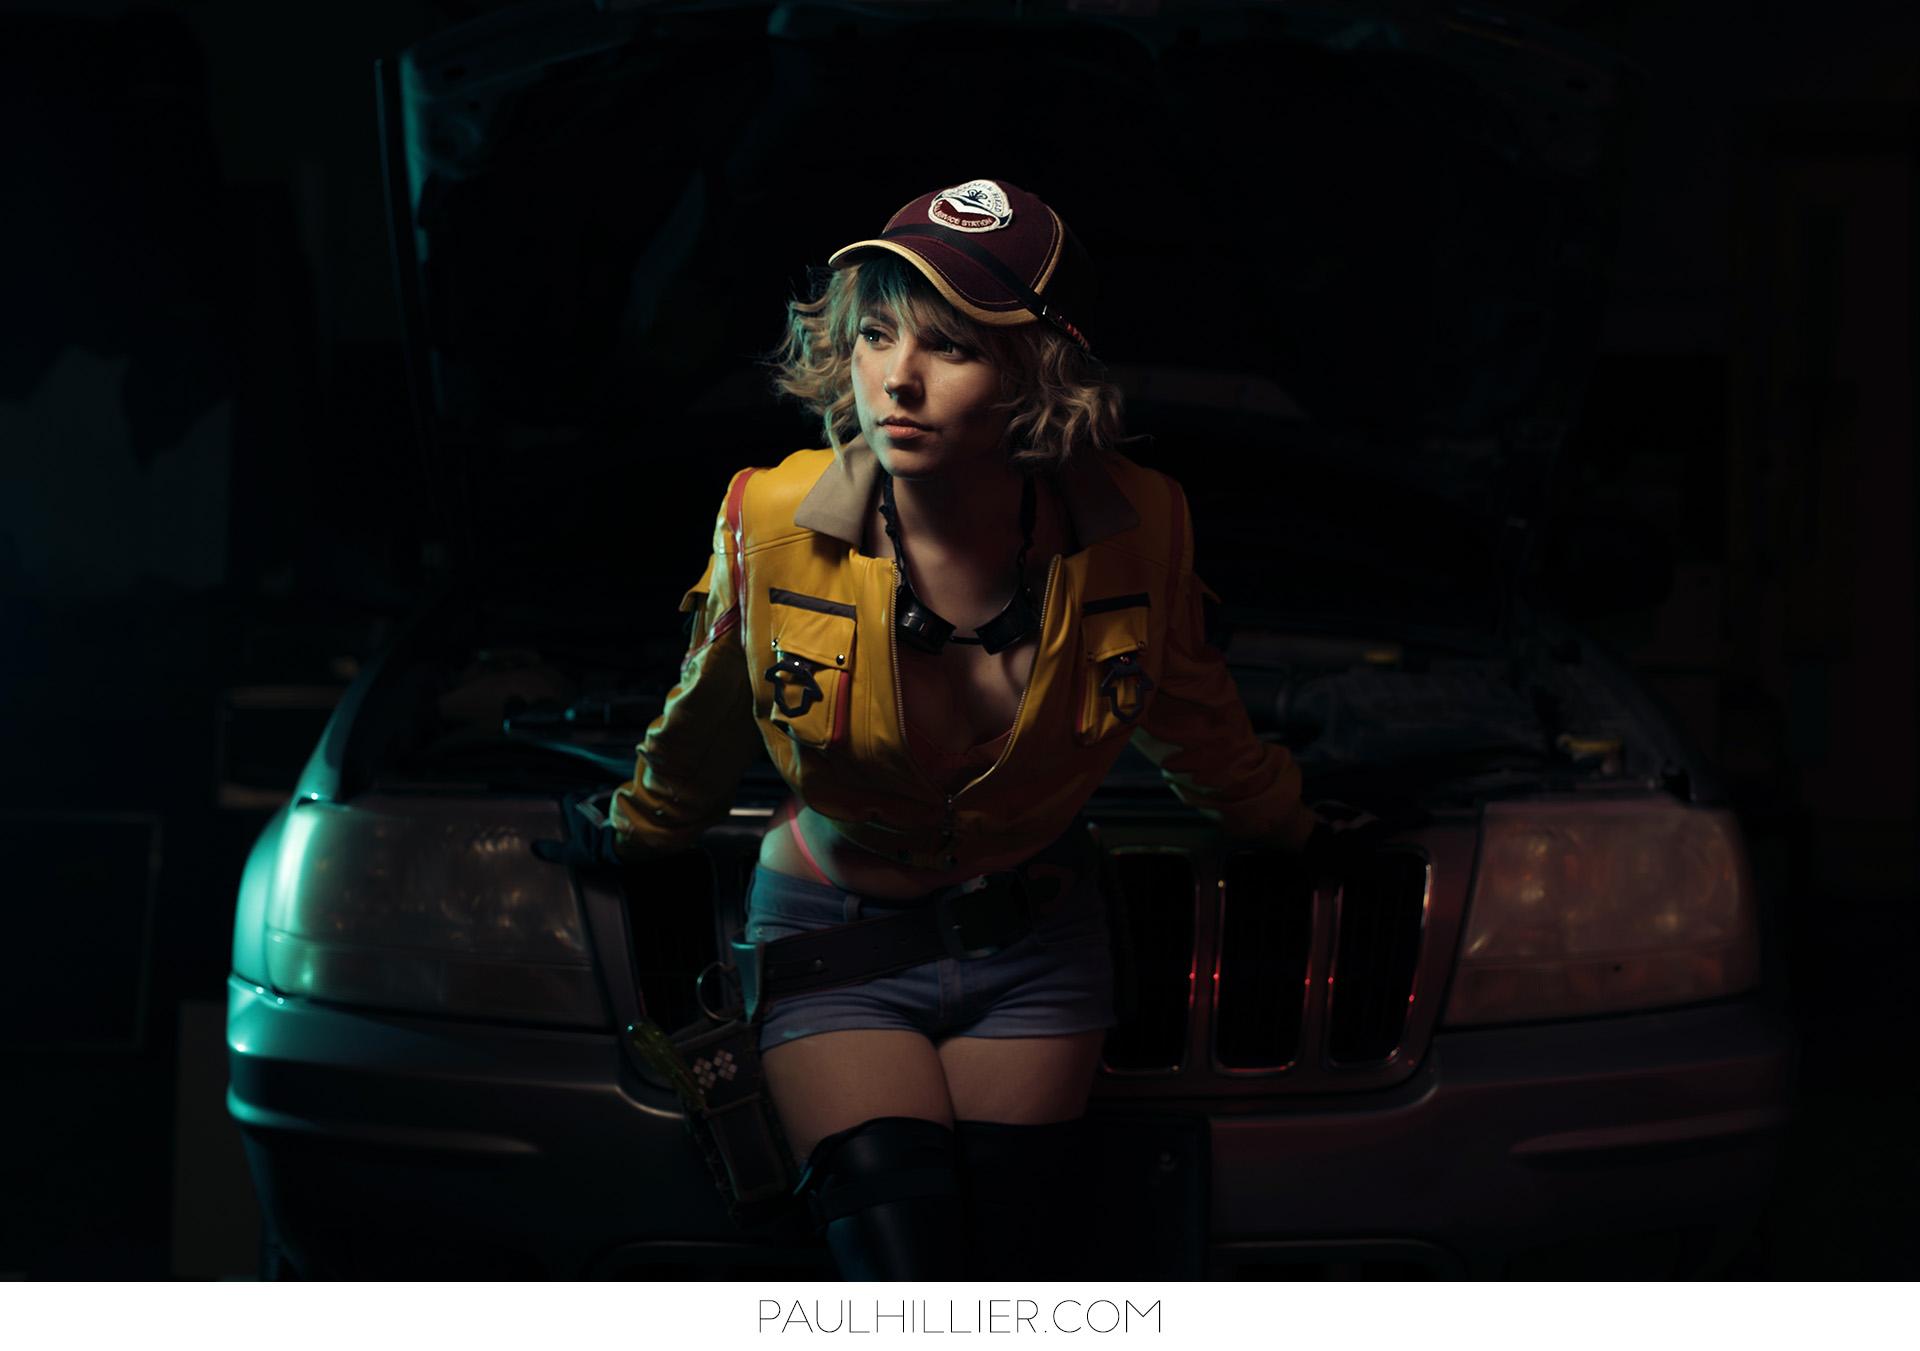 Cindy FFXV Henchmen Props and Sperren Cosplay-1314 sml.jpg